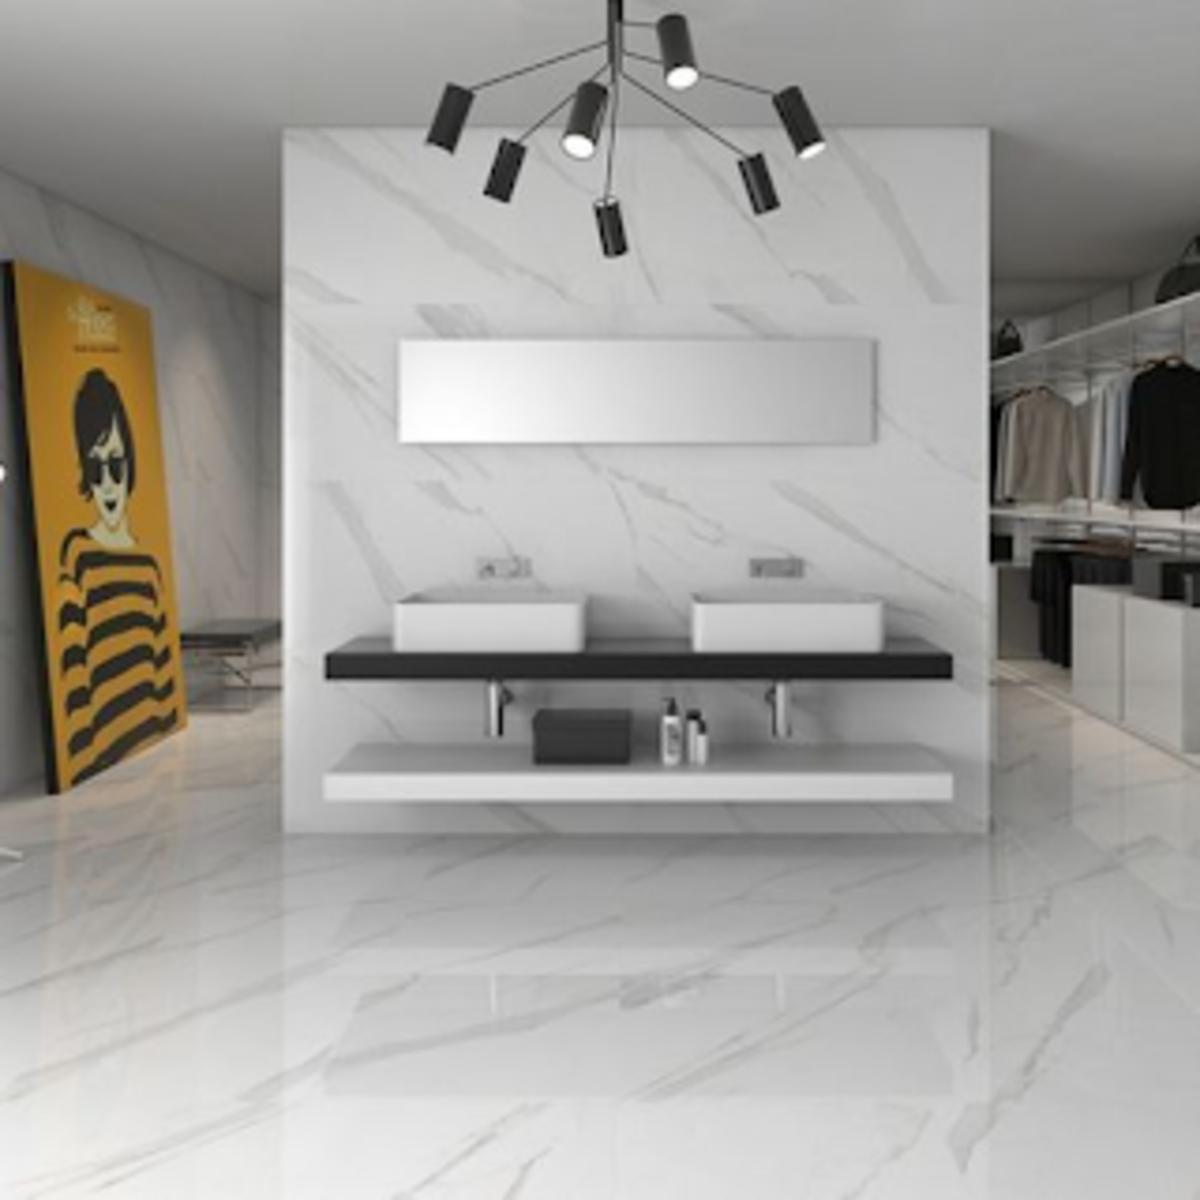 gambar keramik lantai ruang tamu terbaru